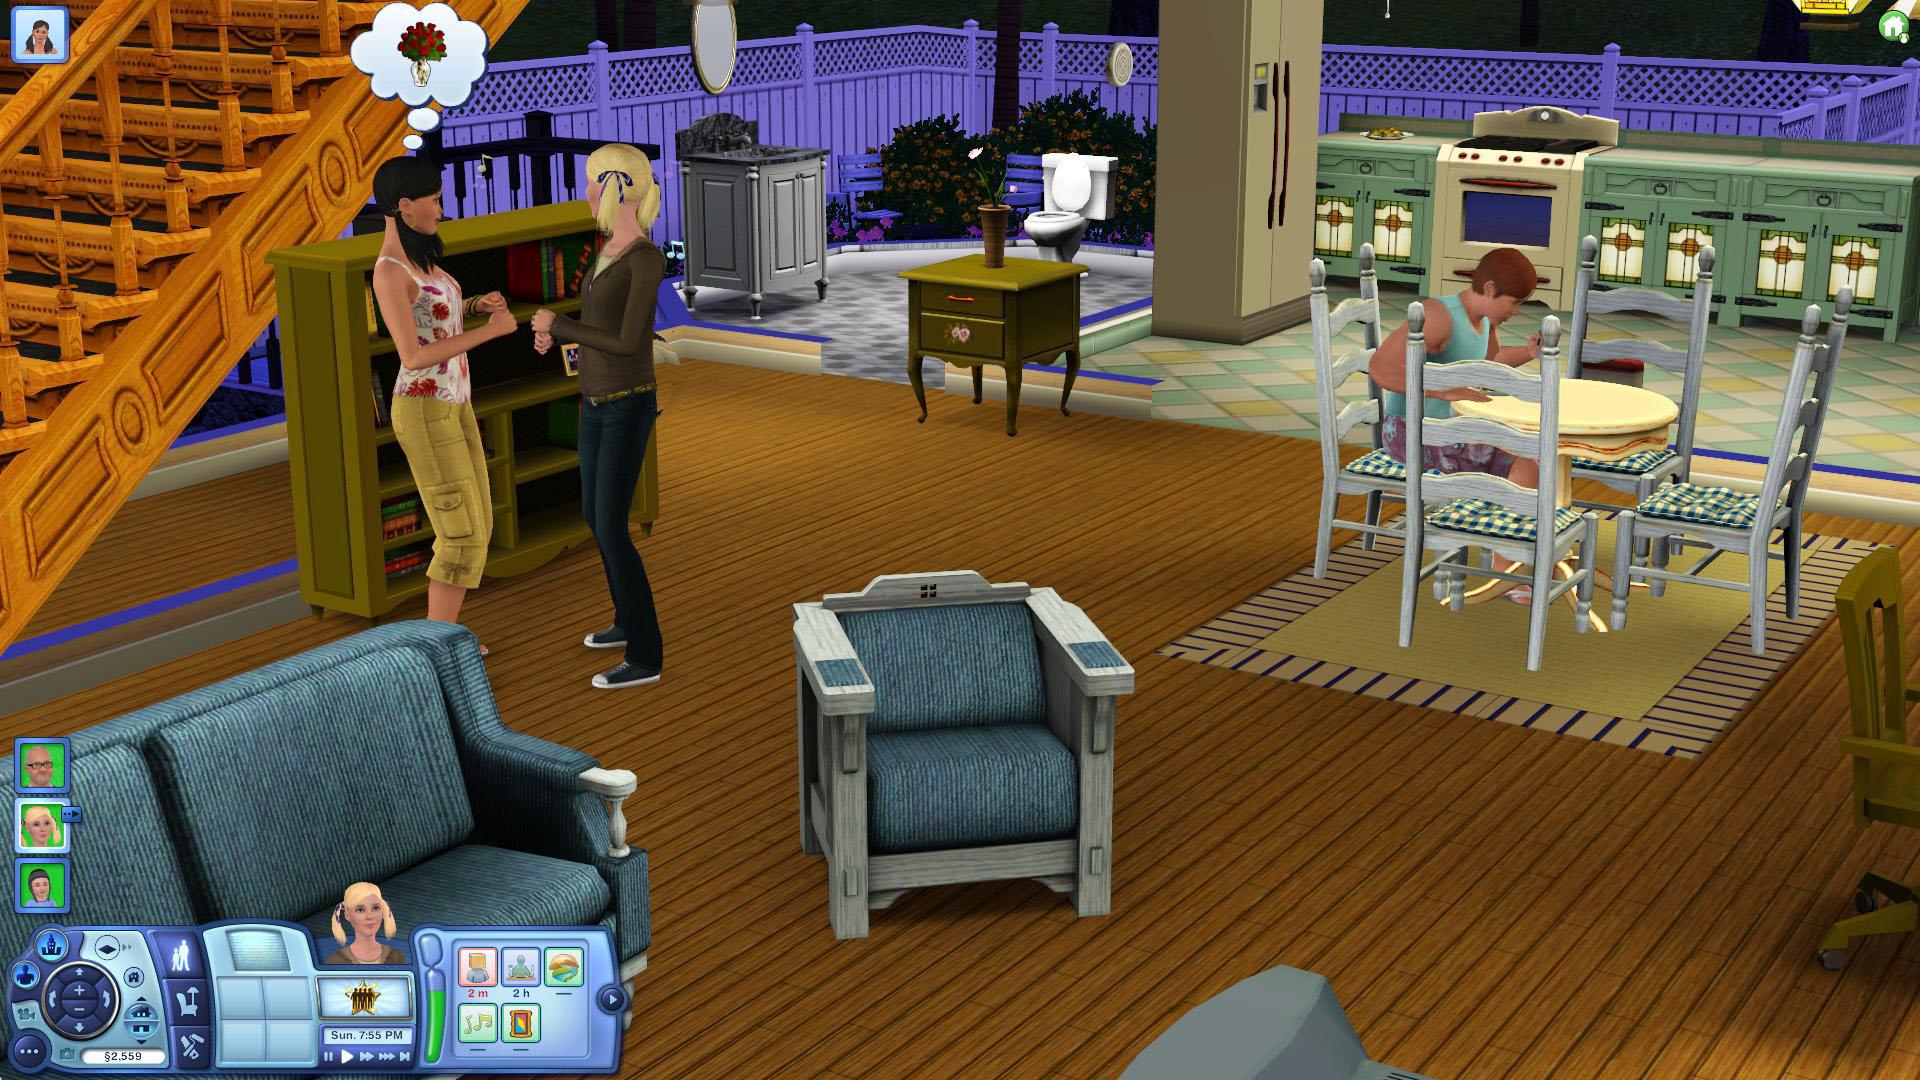 Compras the sims 3 jogo de pc origin download for Sims 3 spielideen